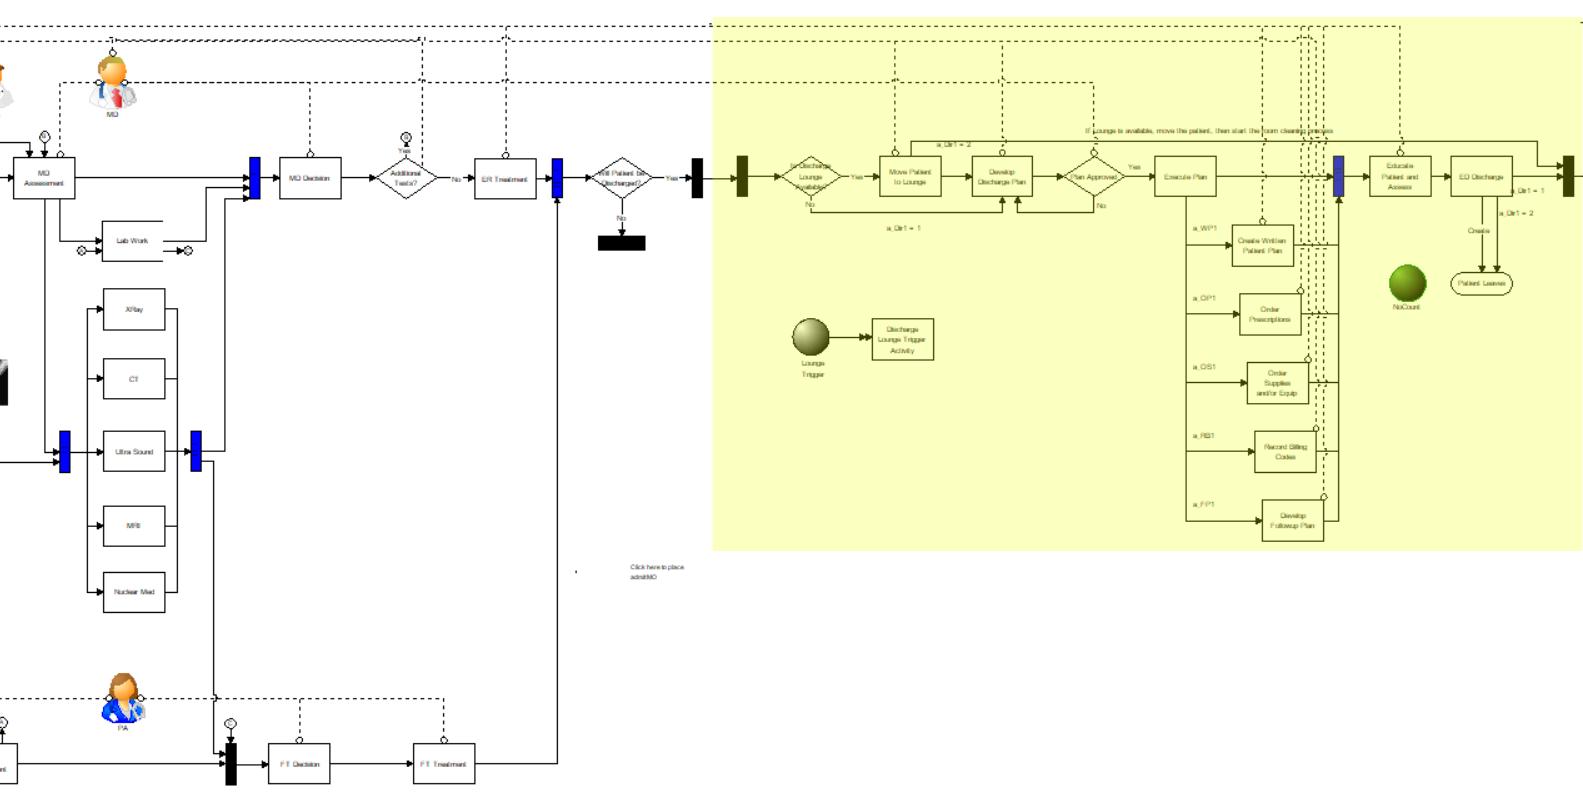 Patient Discharge mode connected